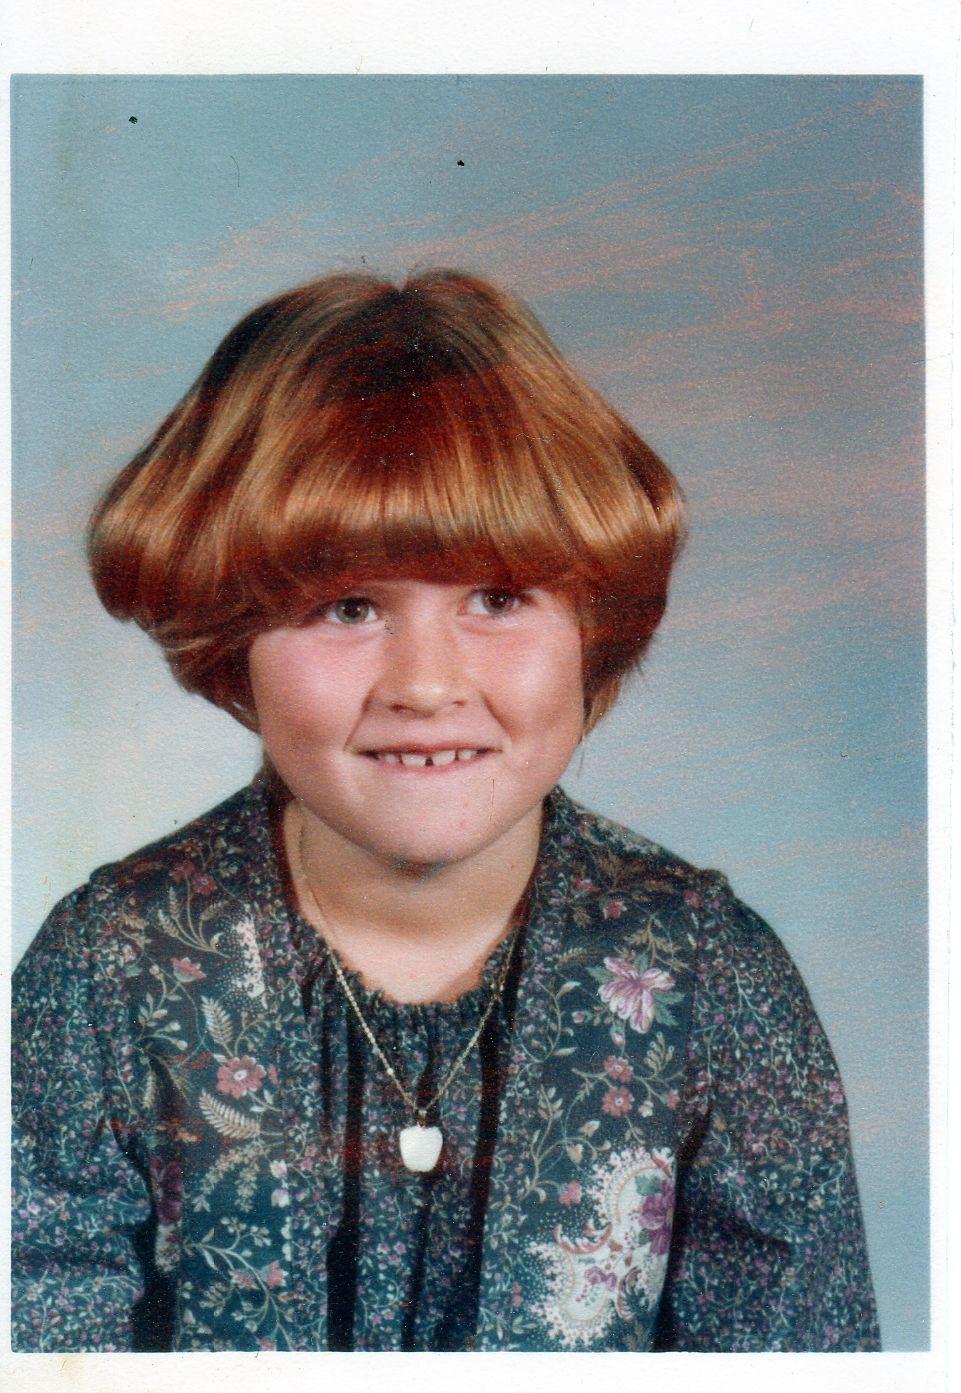 Erin, 2nd grade